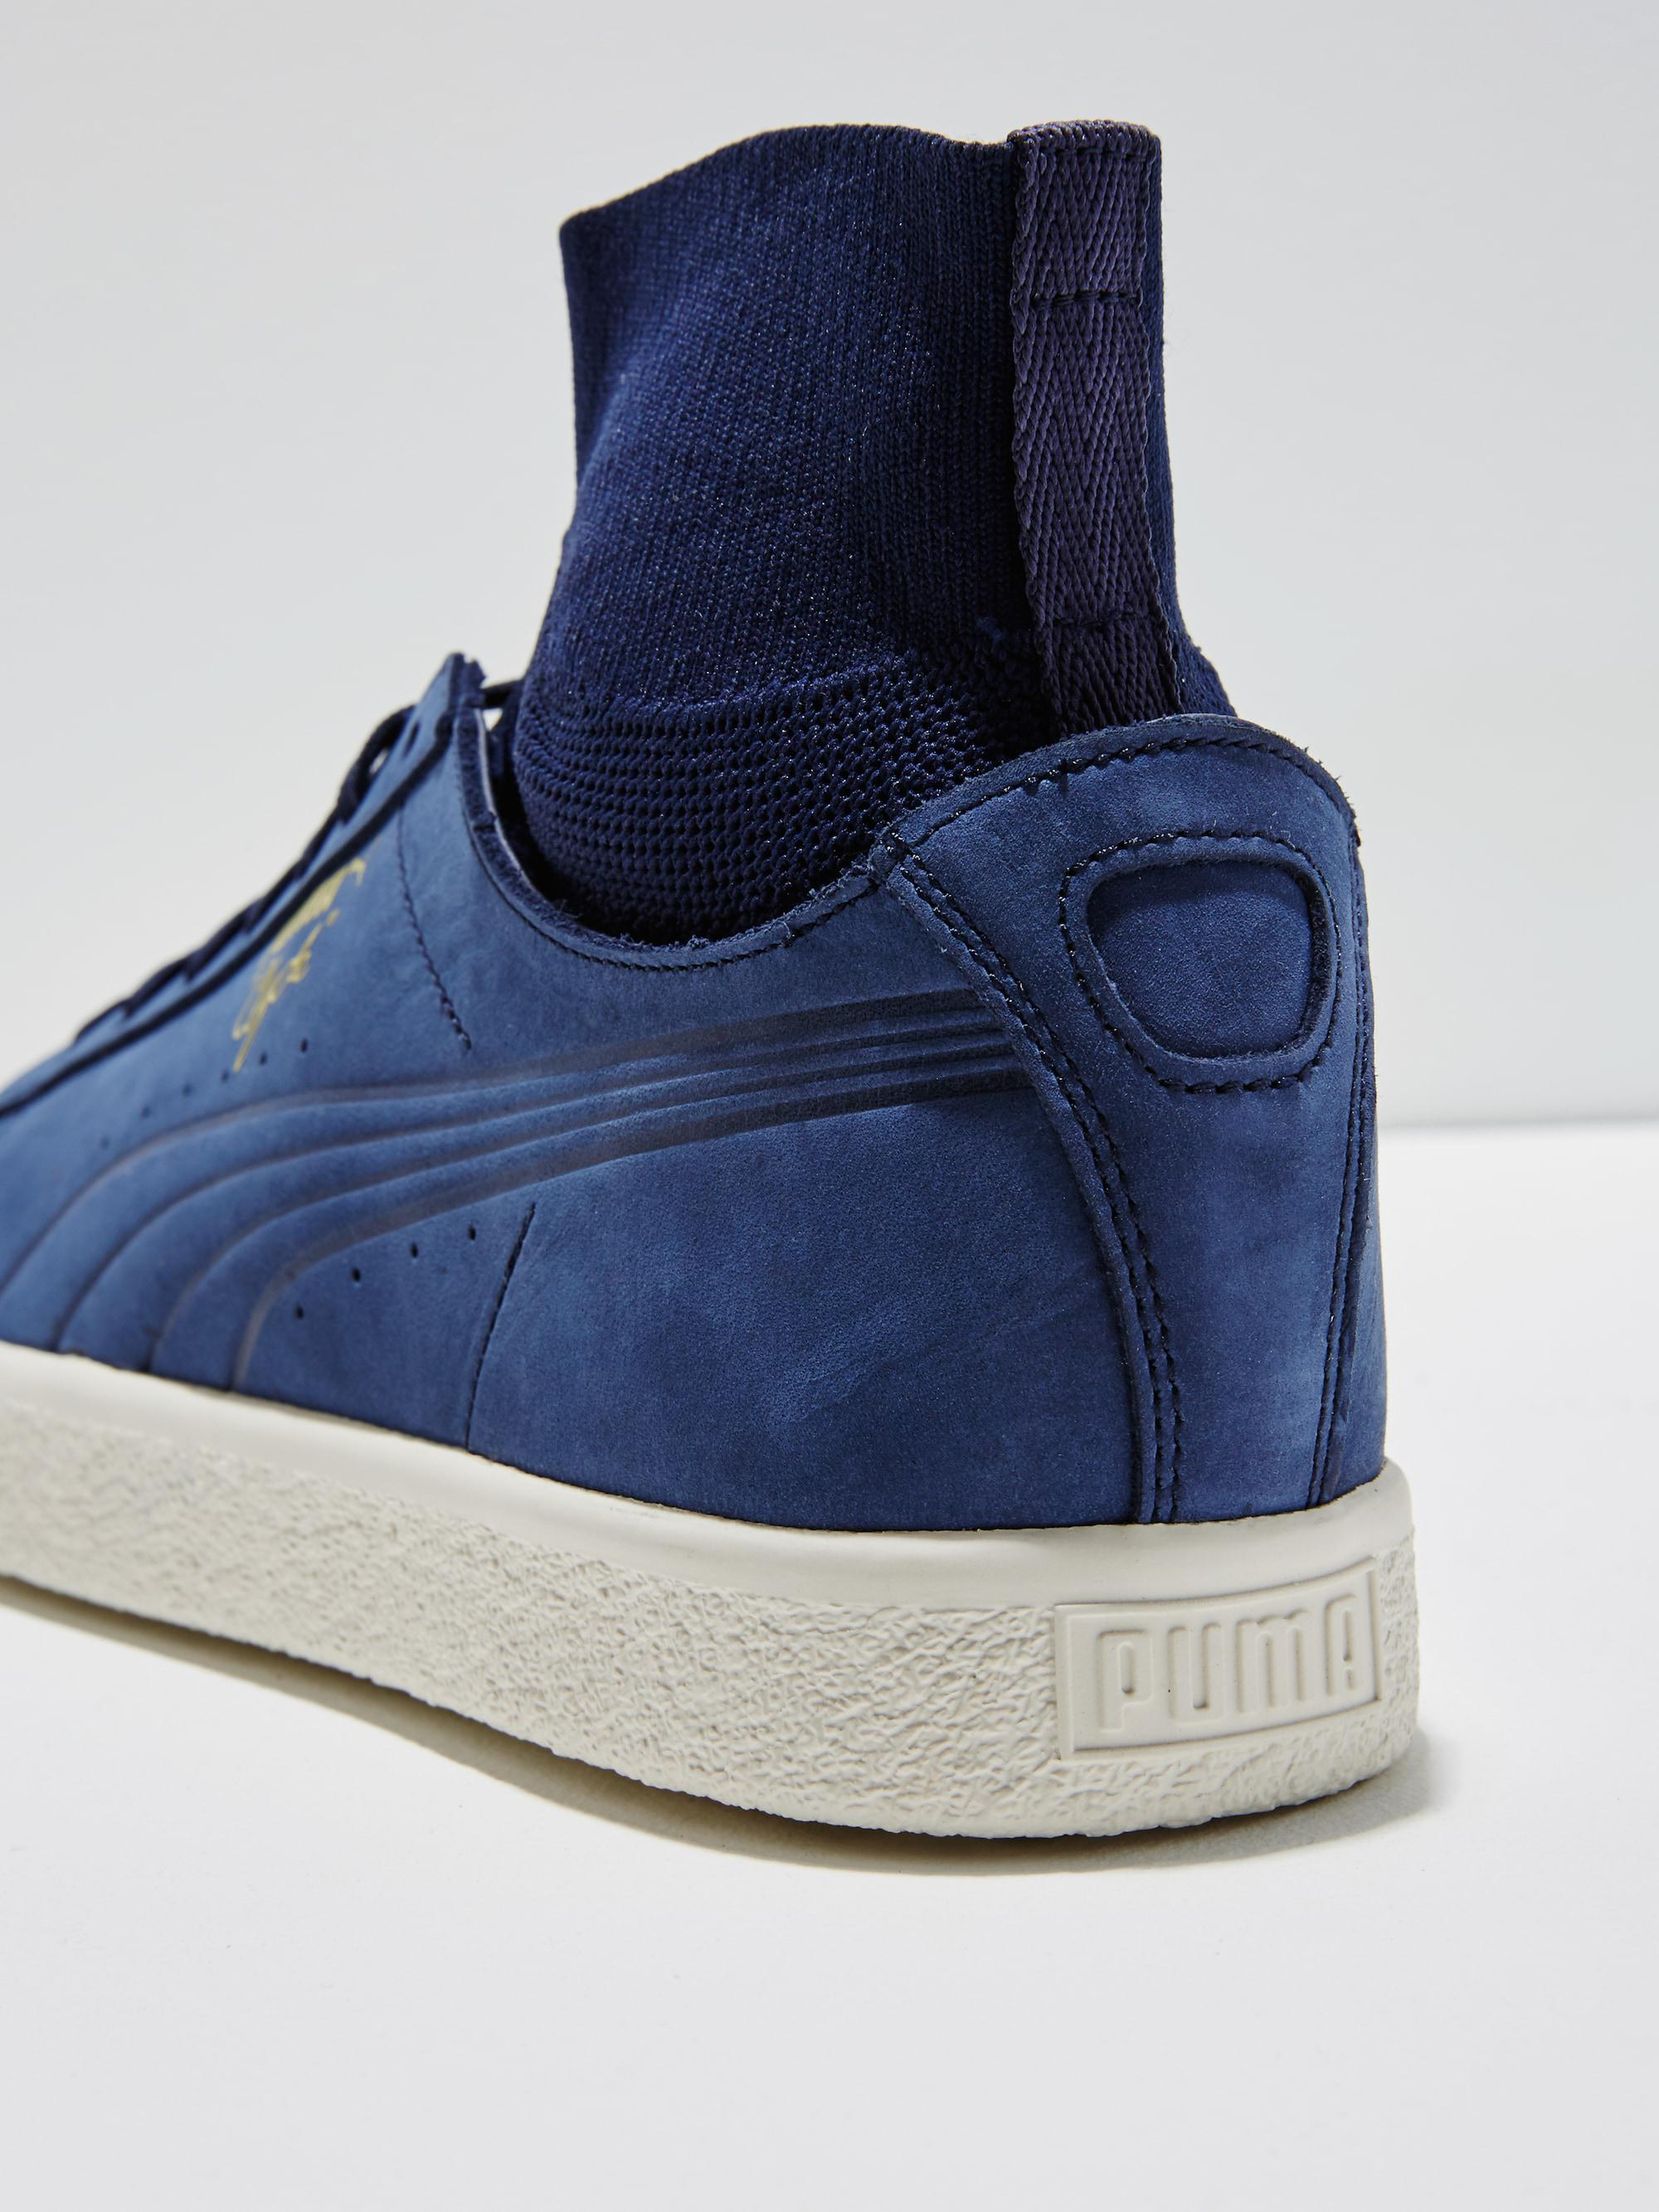 sale retailer 168b3 54033 Frank And Oak Blue Puma Clyde Sock In Peacoat for men